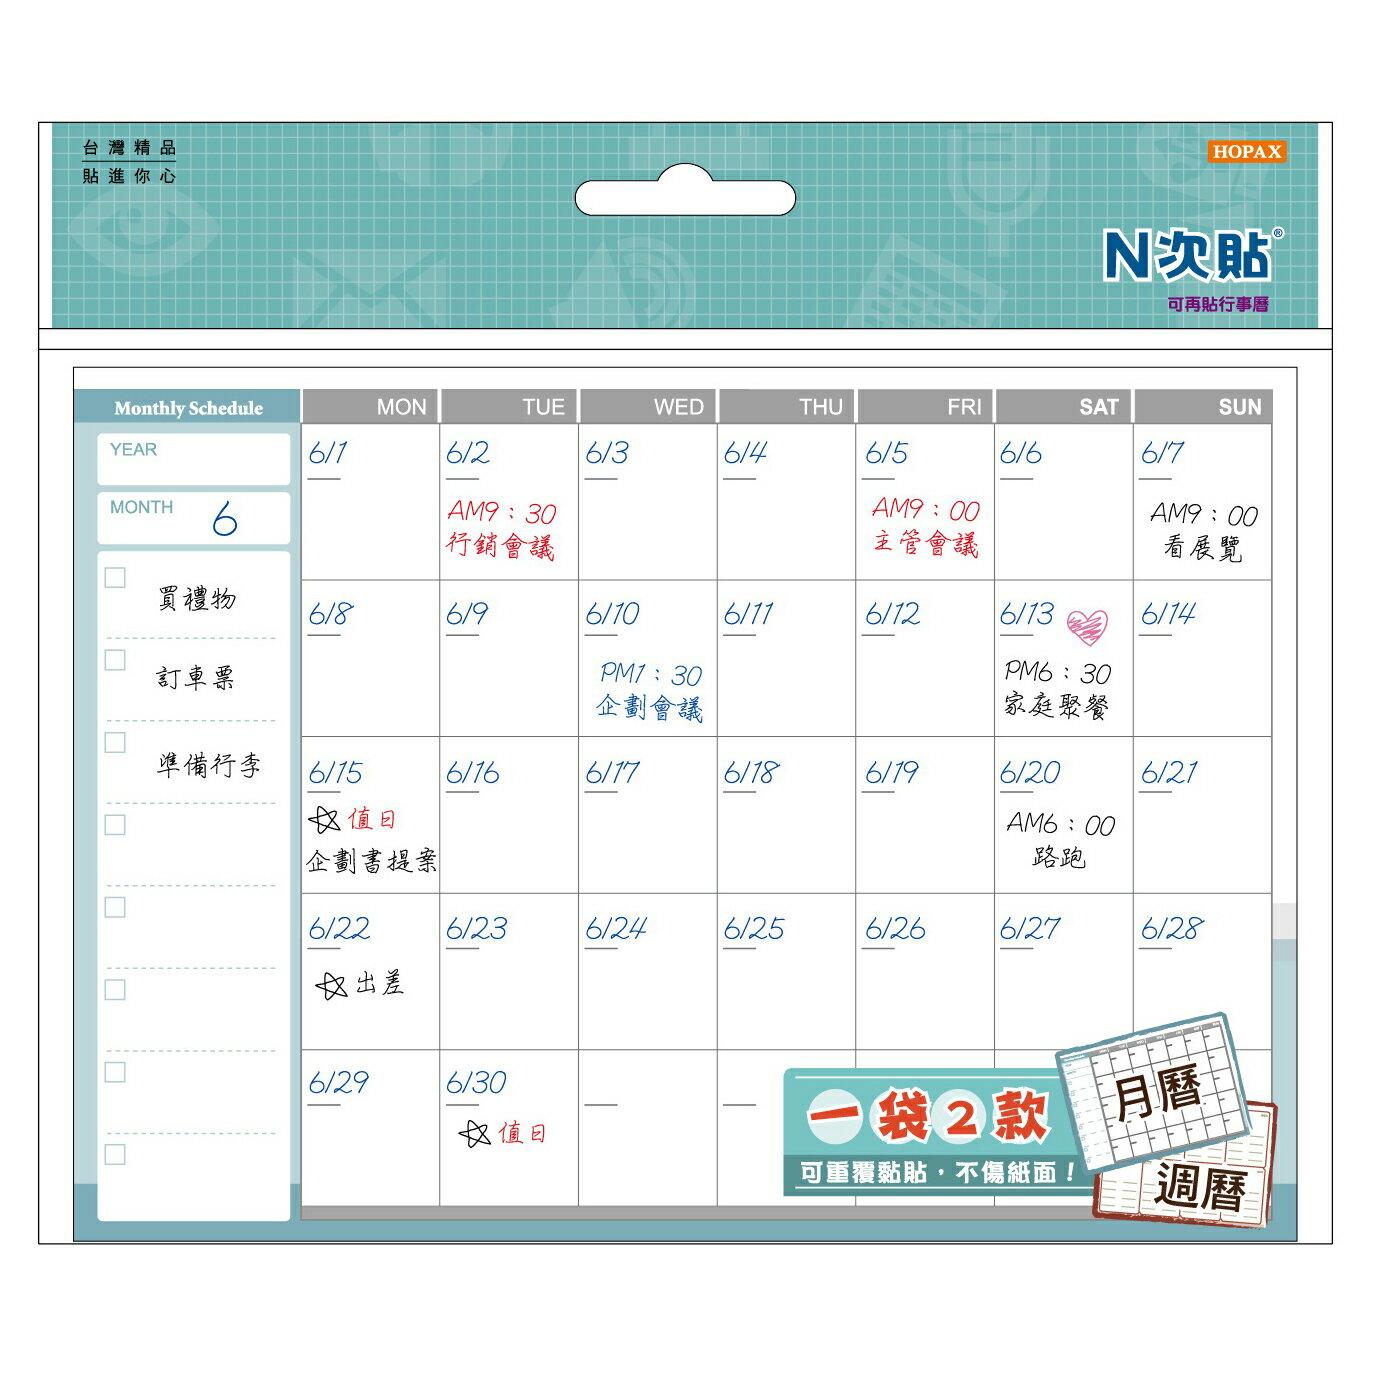 N次貼 可再貼行事曆便條紙 61626 週曆+月曆 127x178mm 40張/2本